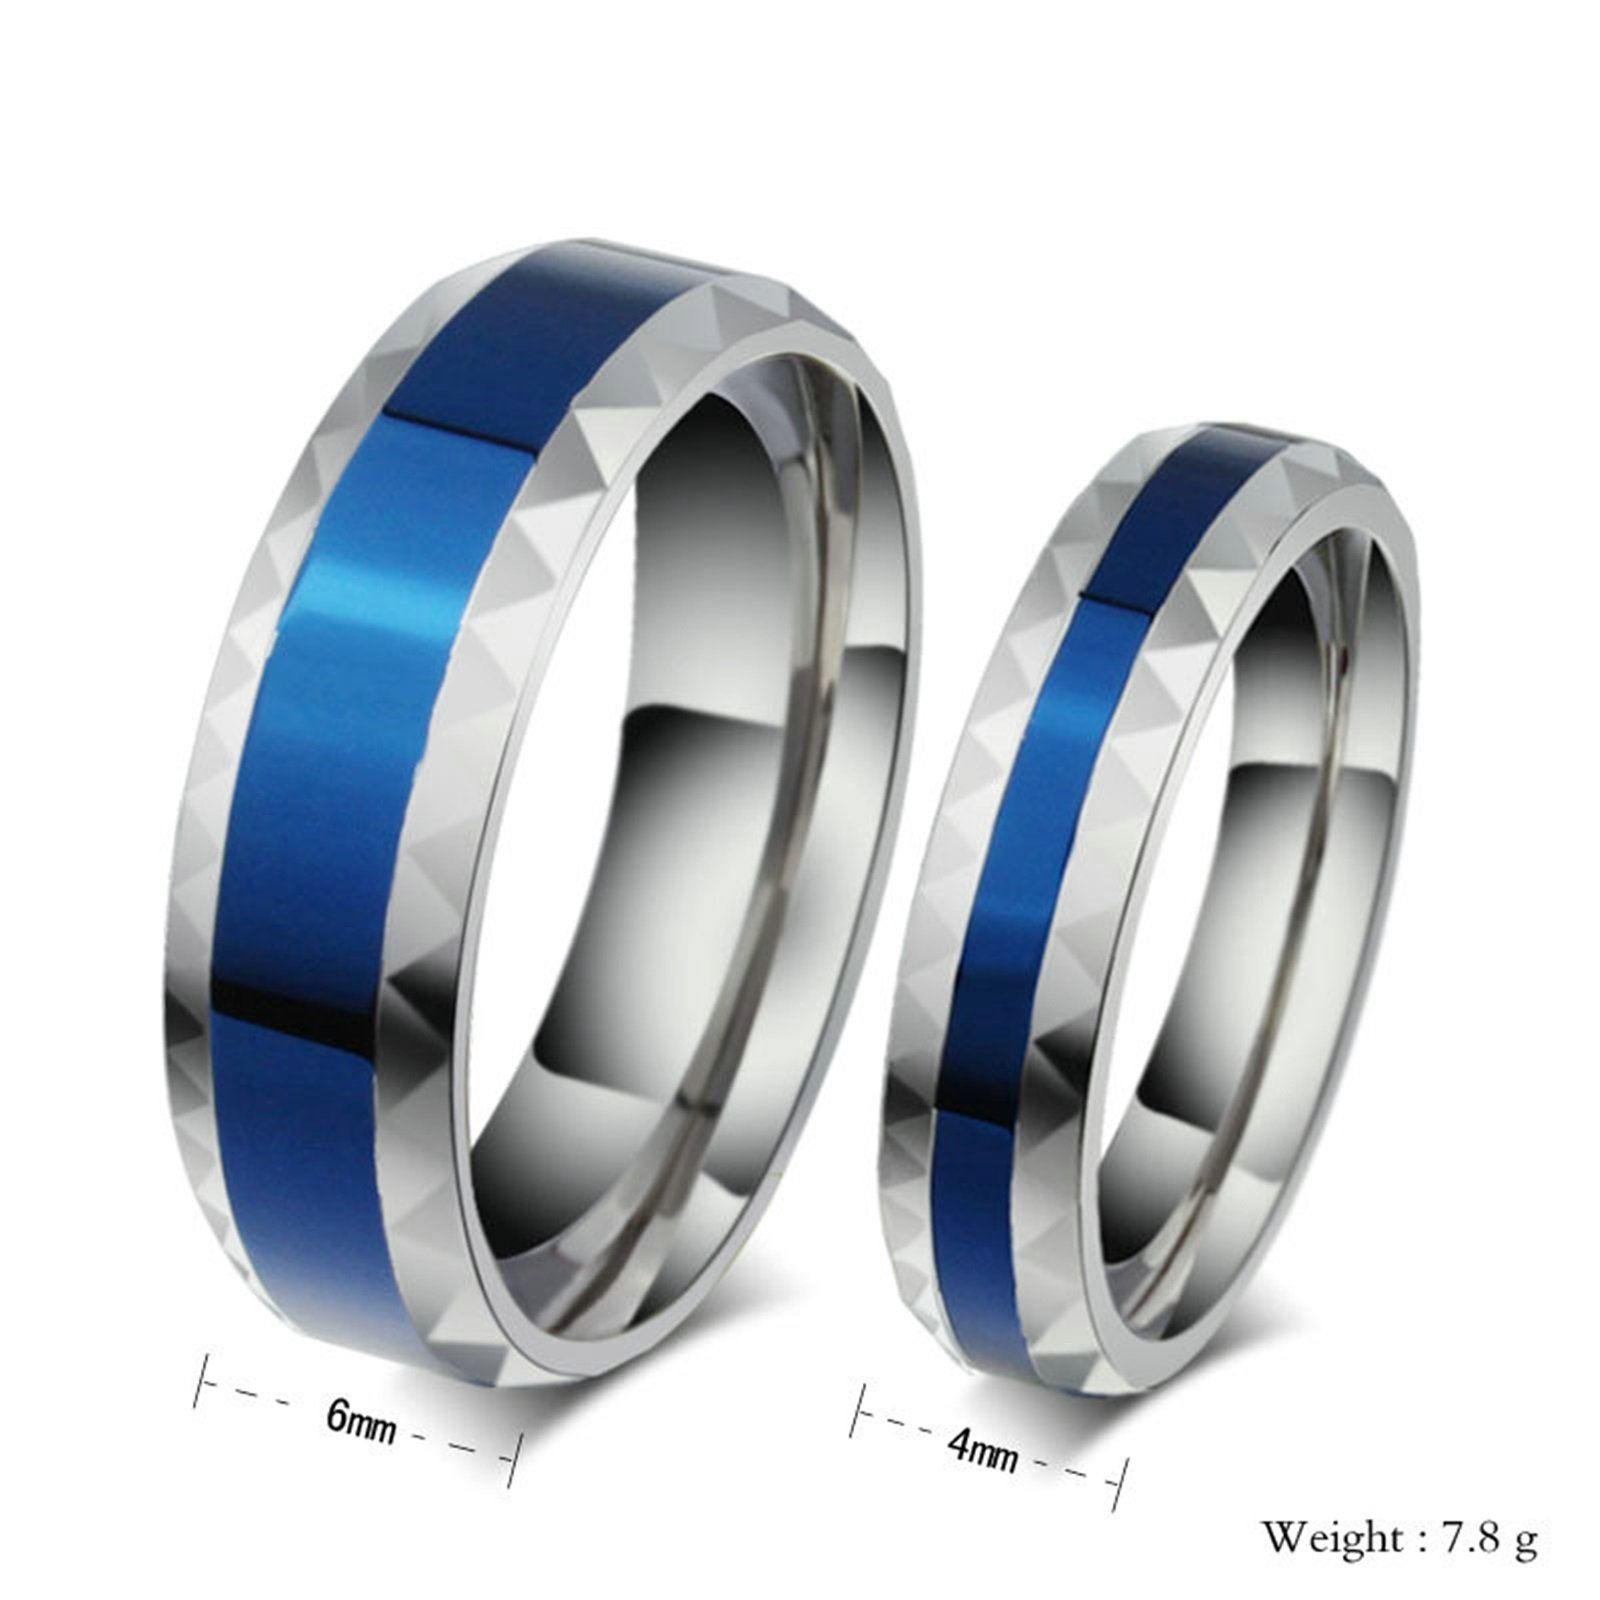 Beydodo 1PCS Stainless Steel Ring 8 Round 6MM Width Wedding Rings Mens Love Ring Band by Beydodo (Image #2)